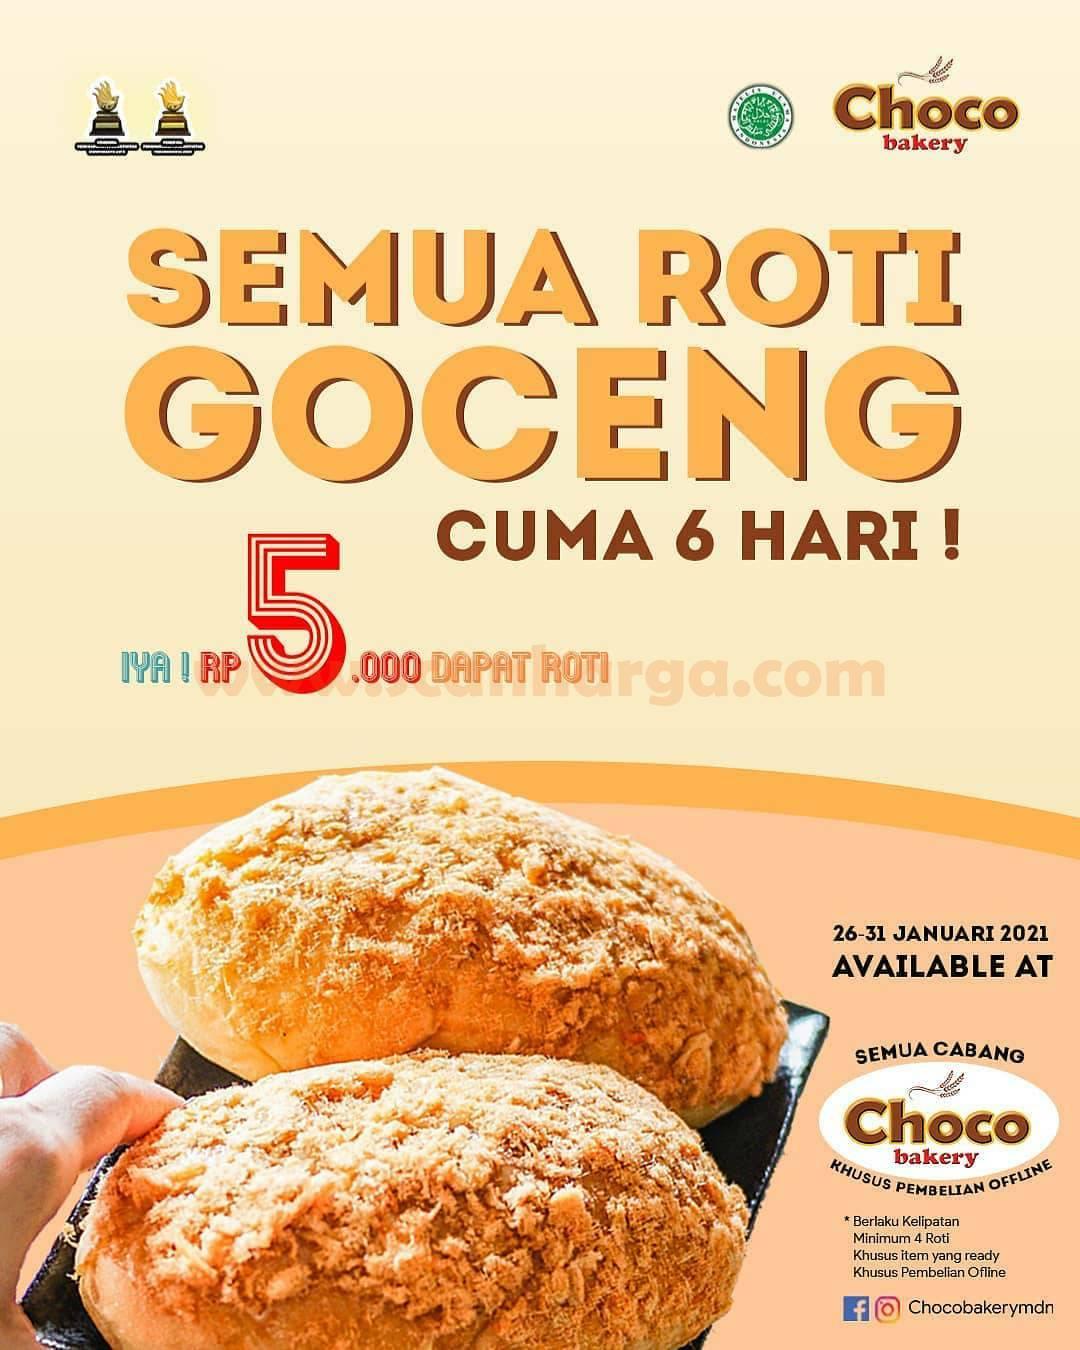 CHOCO BAKERY Promo Semua Roti GOCENG!